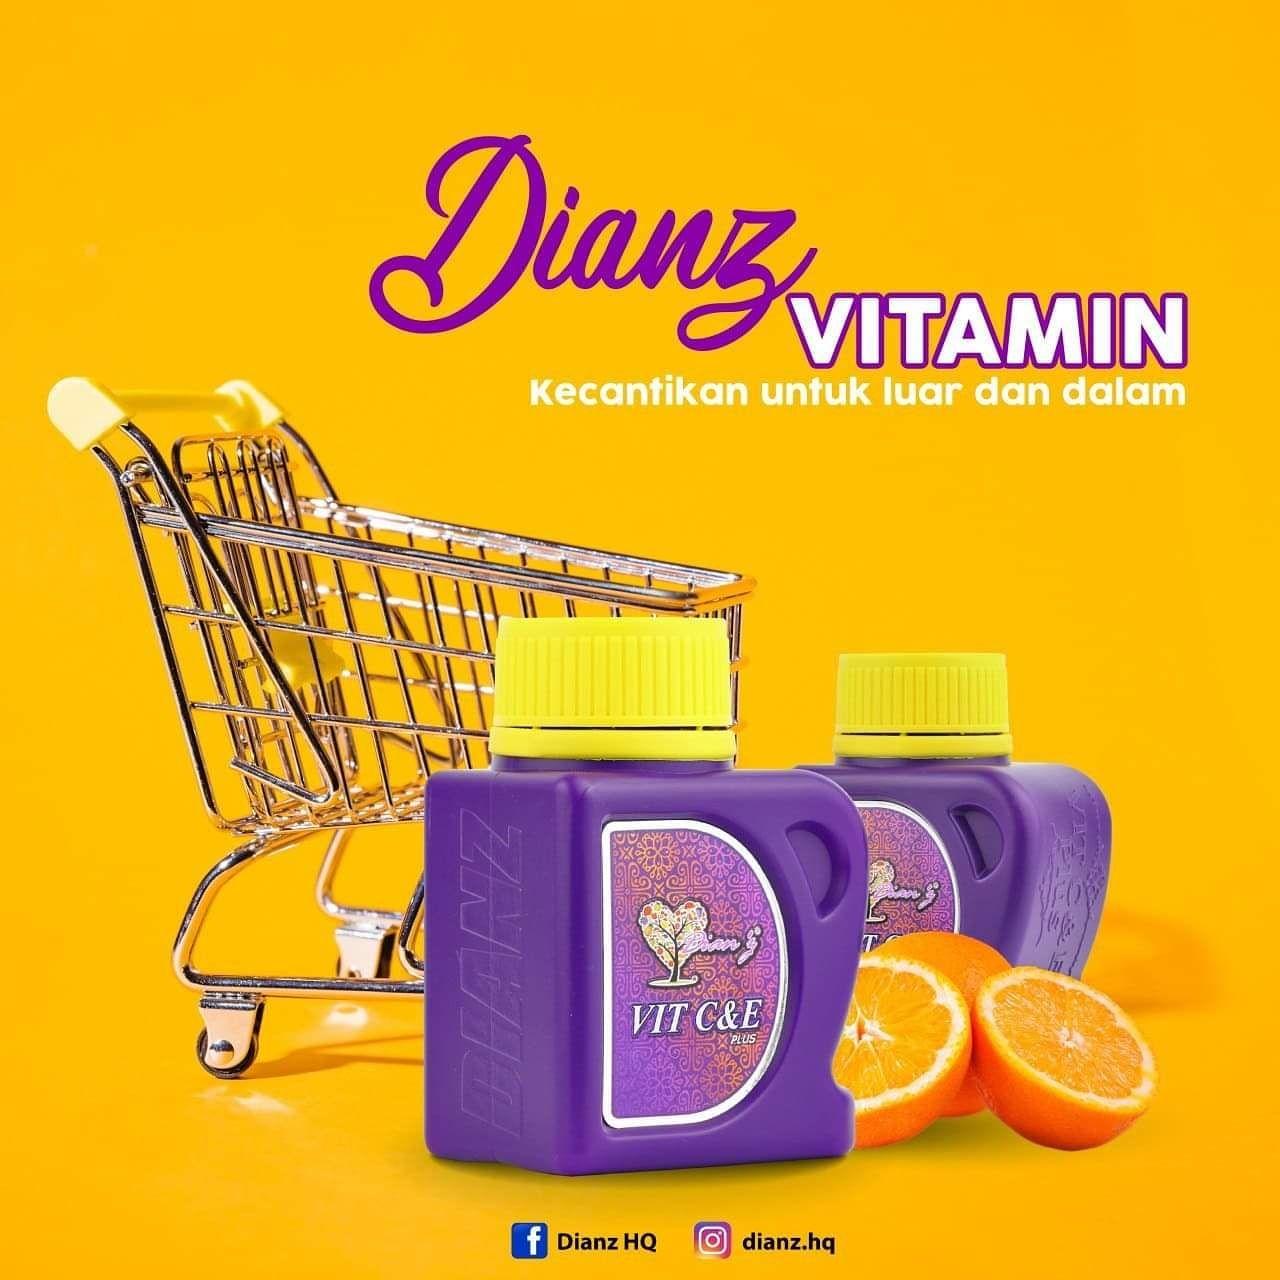 Dianz vitamin- pengalaman pengunaan & kebaikan vitamin C dan E